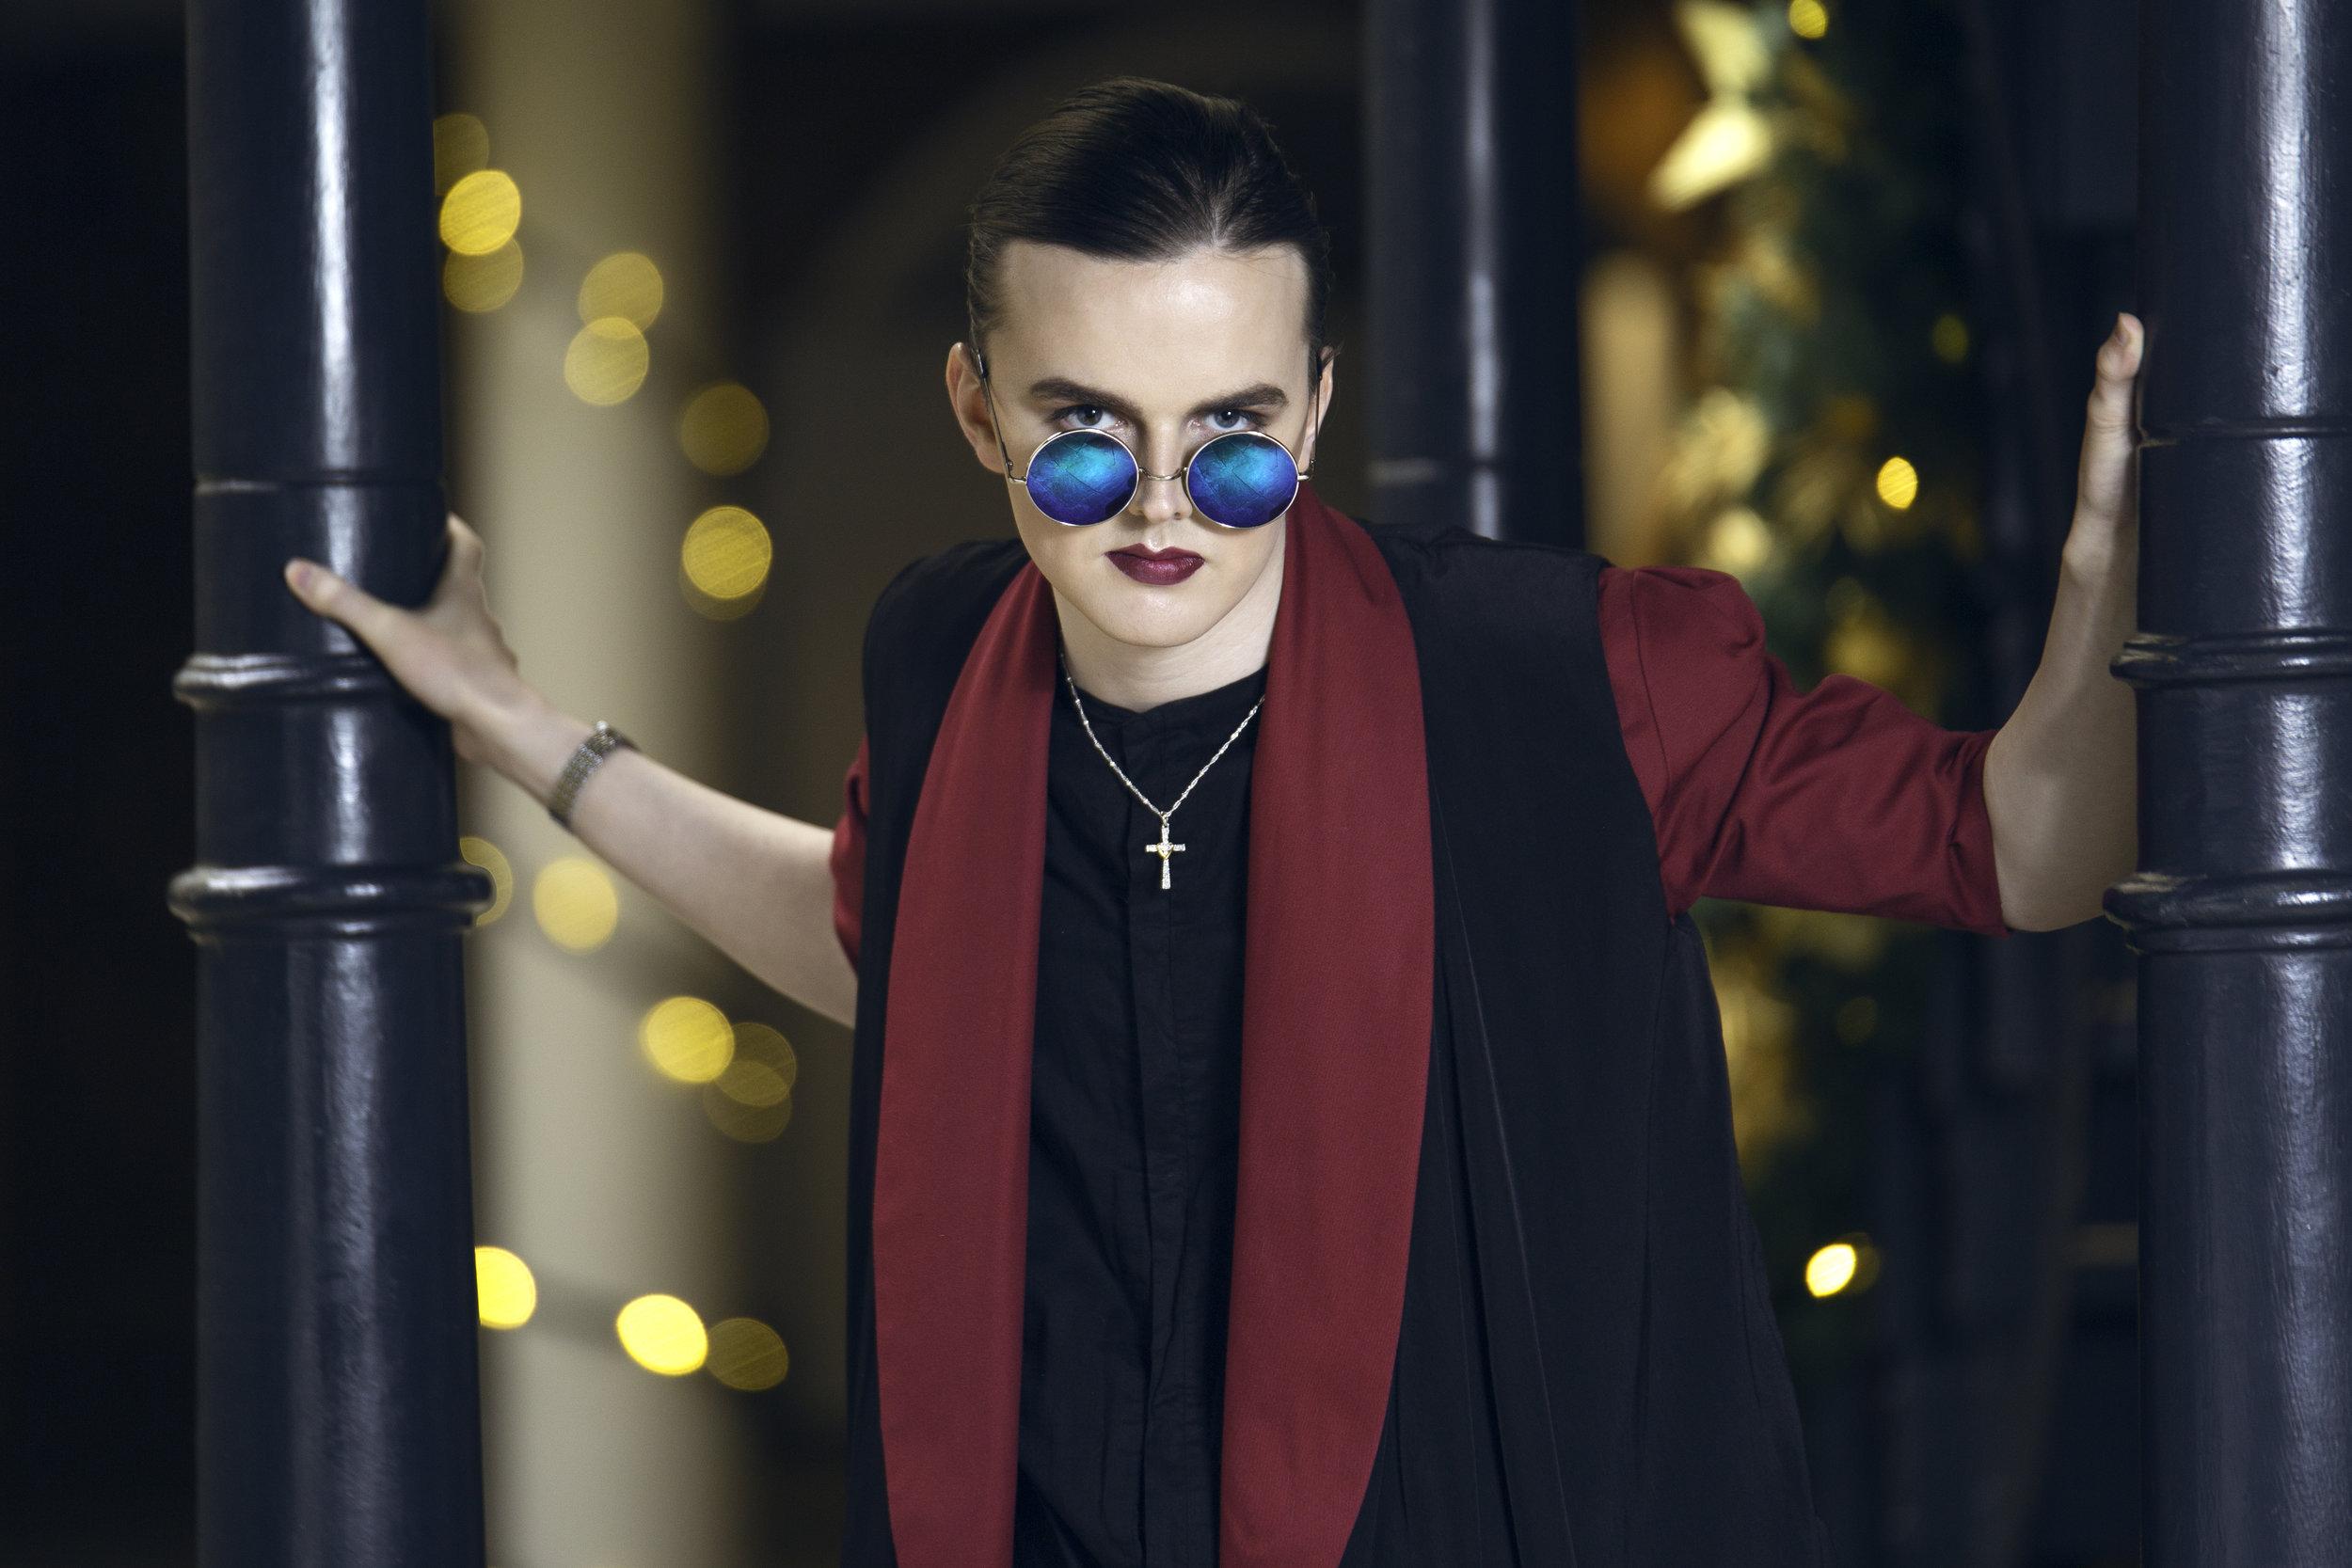 zaramia-ava-zaramiaava-leeds-fashion-designer-ethical-sustainable-black-jacket-drape-red-mai-mioka-shirt-unisex-dress-grey-6.jpg